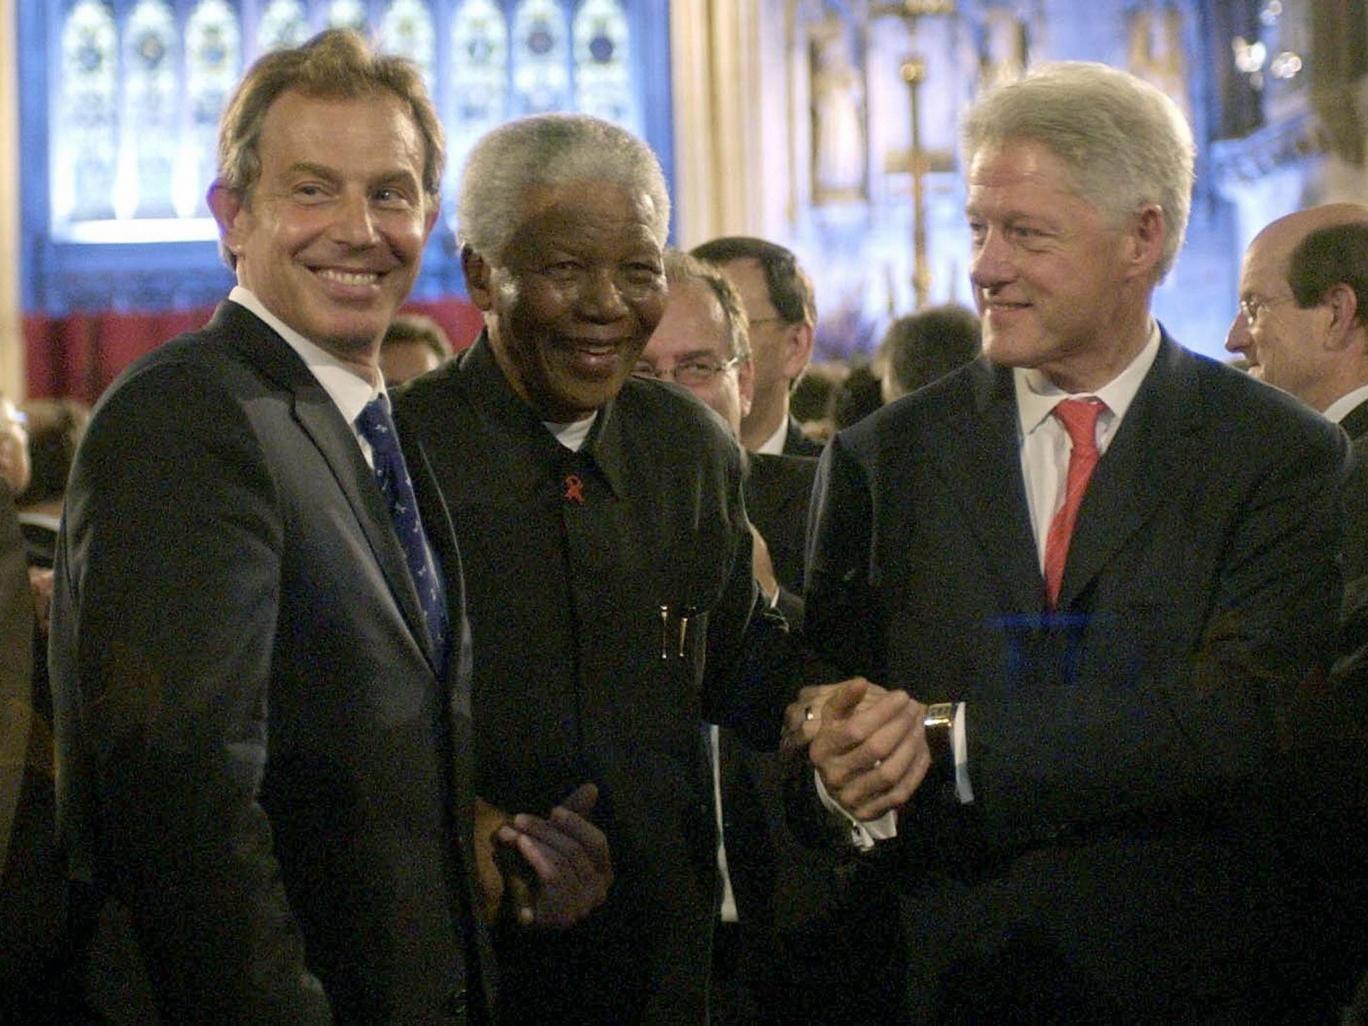 Tony Blair, Nelson Mandela and Bill Clinton in July 2003